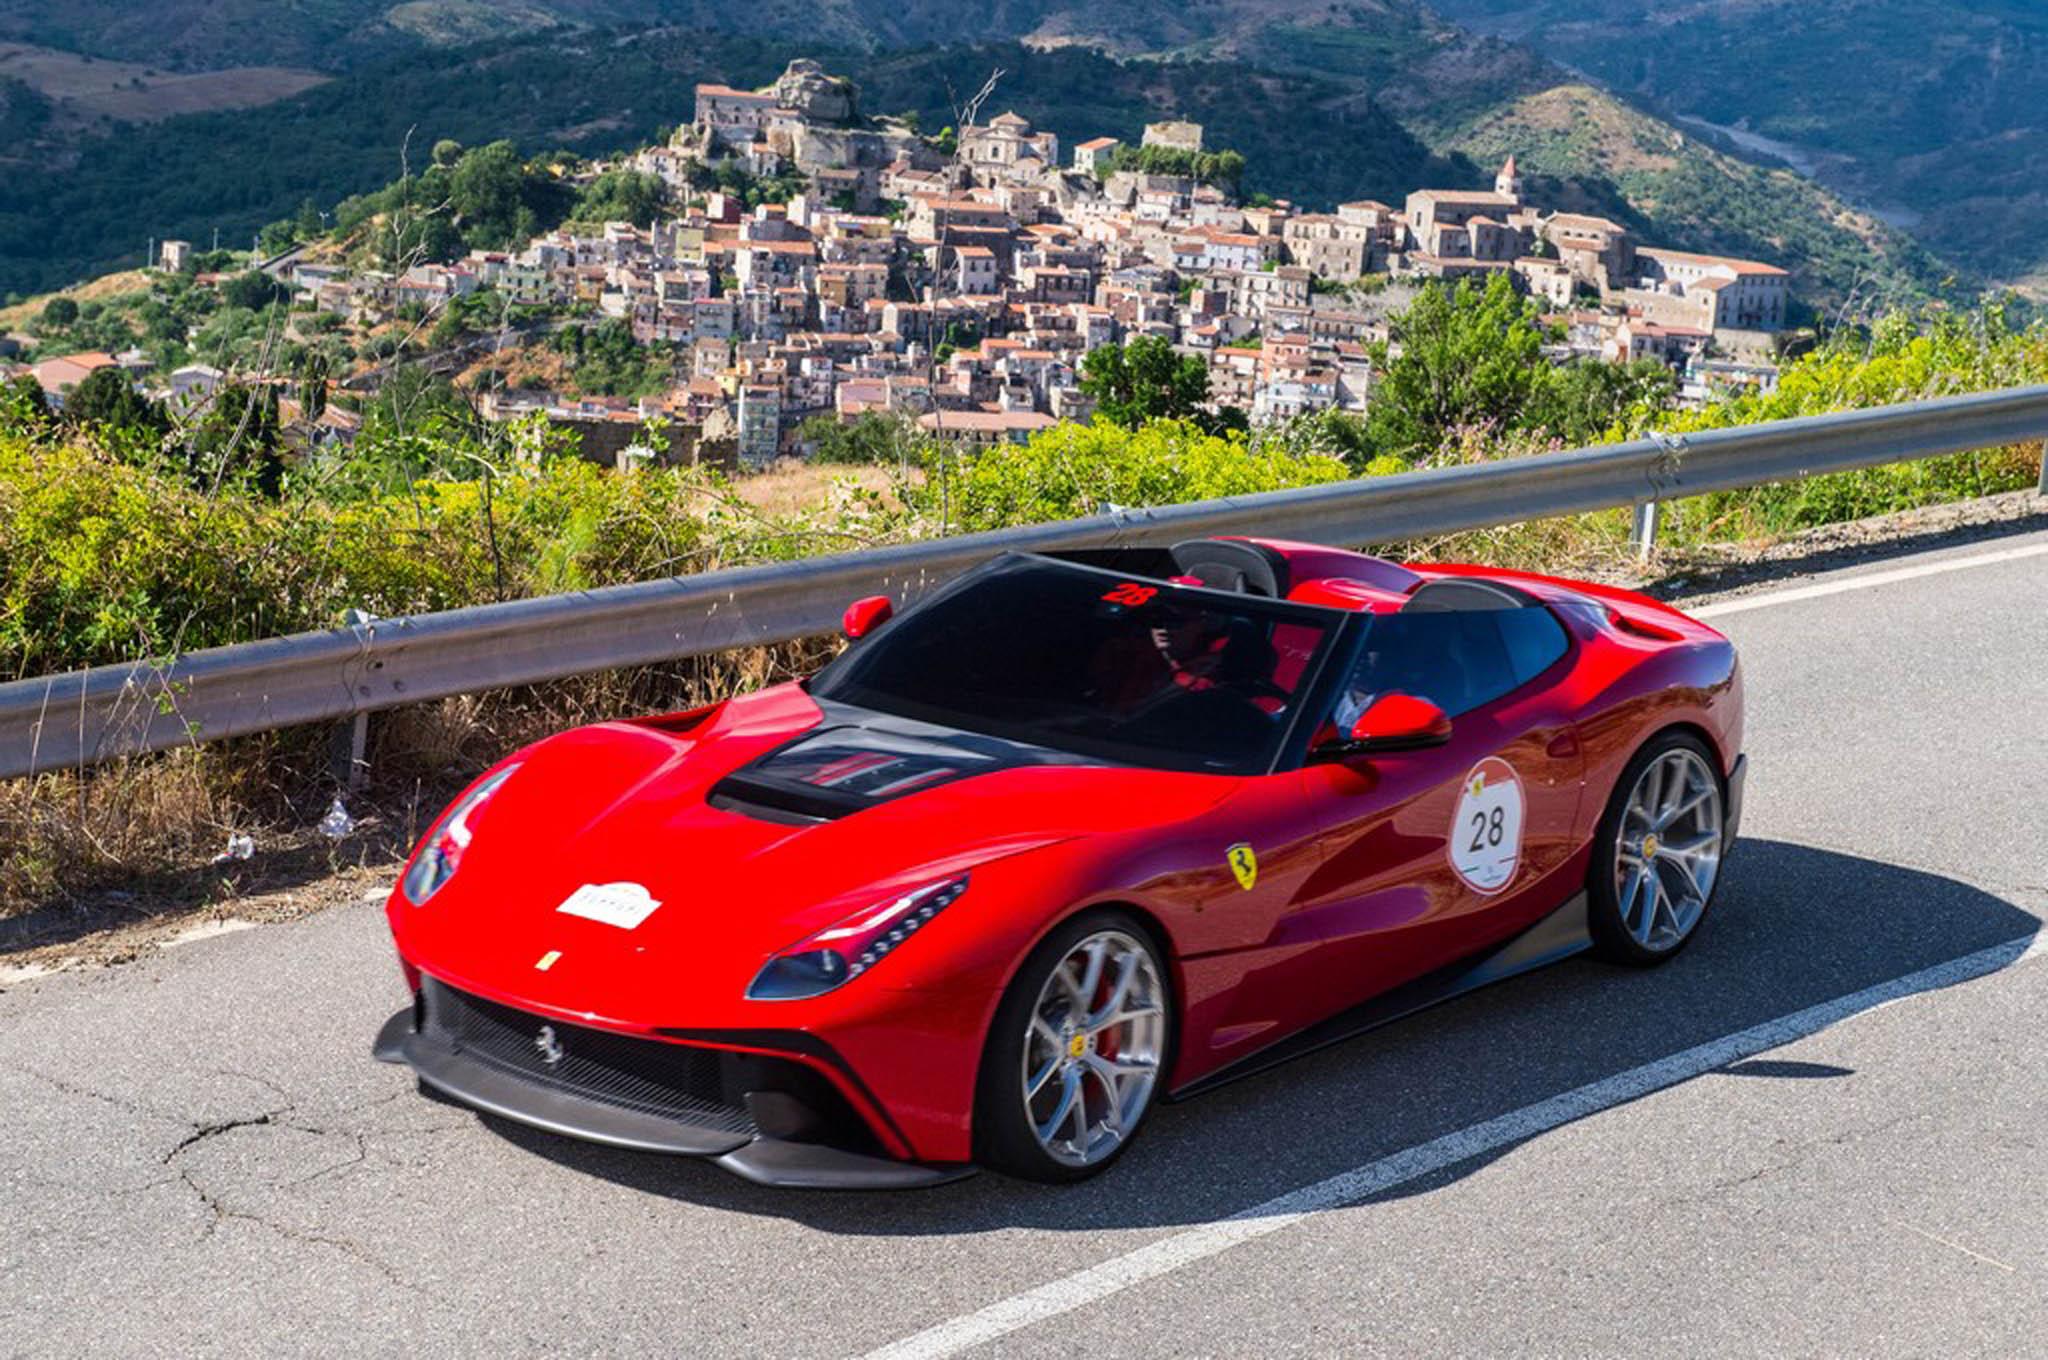 Ferrari F12 Trs In Motion